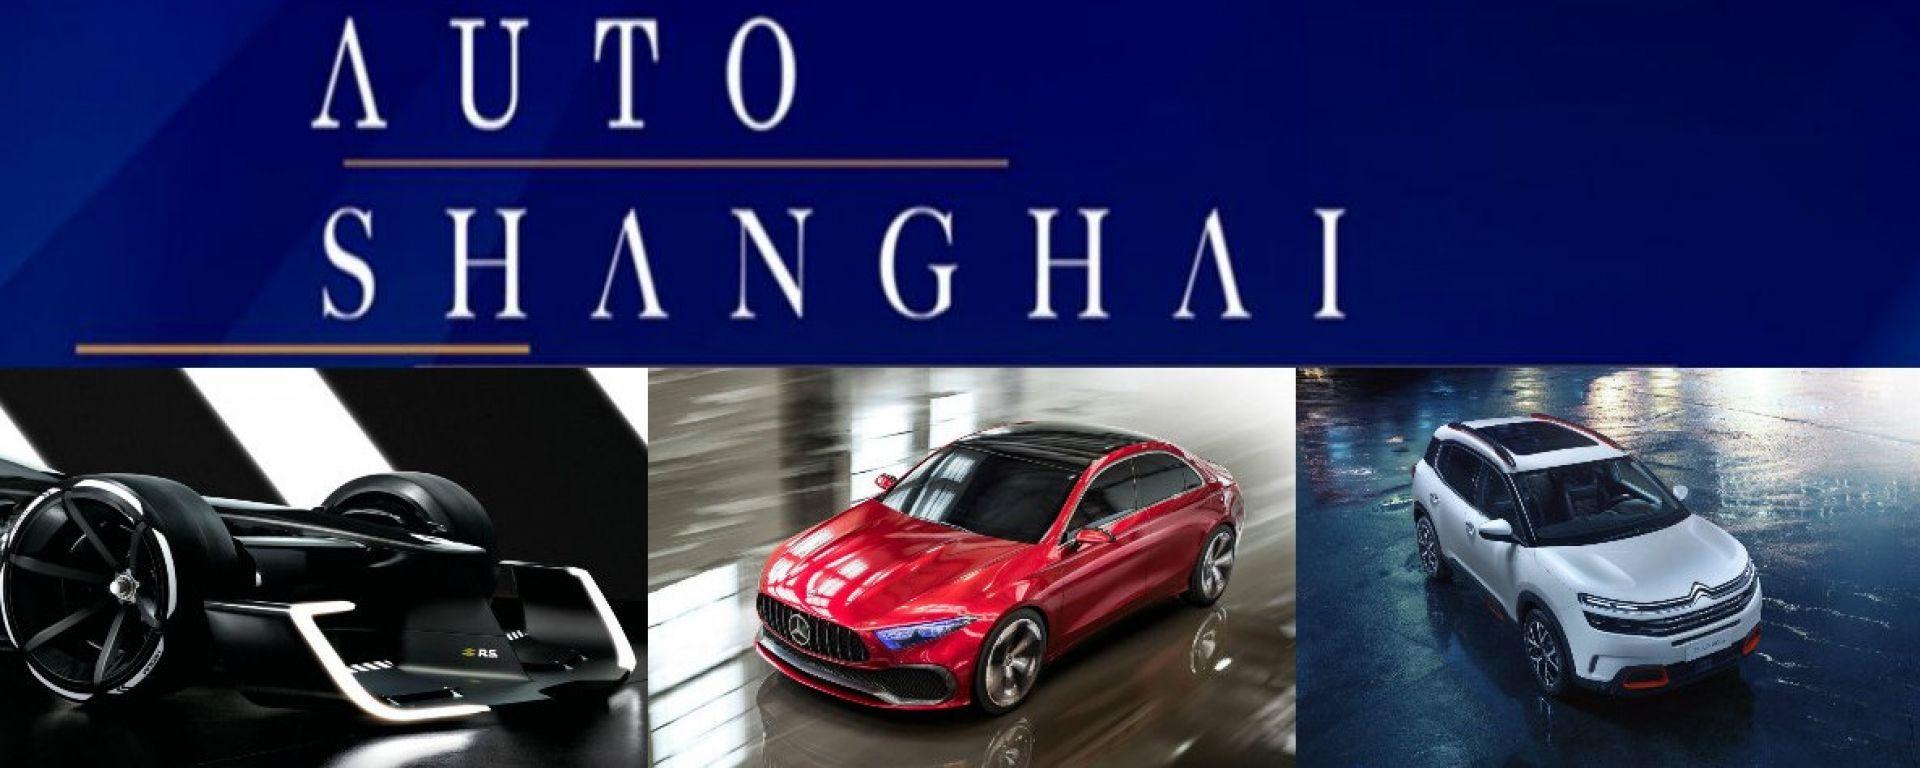 Salone di Shanghai 2017, tutte le novità